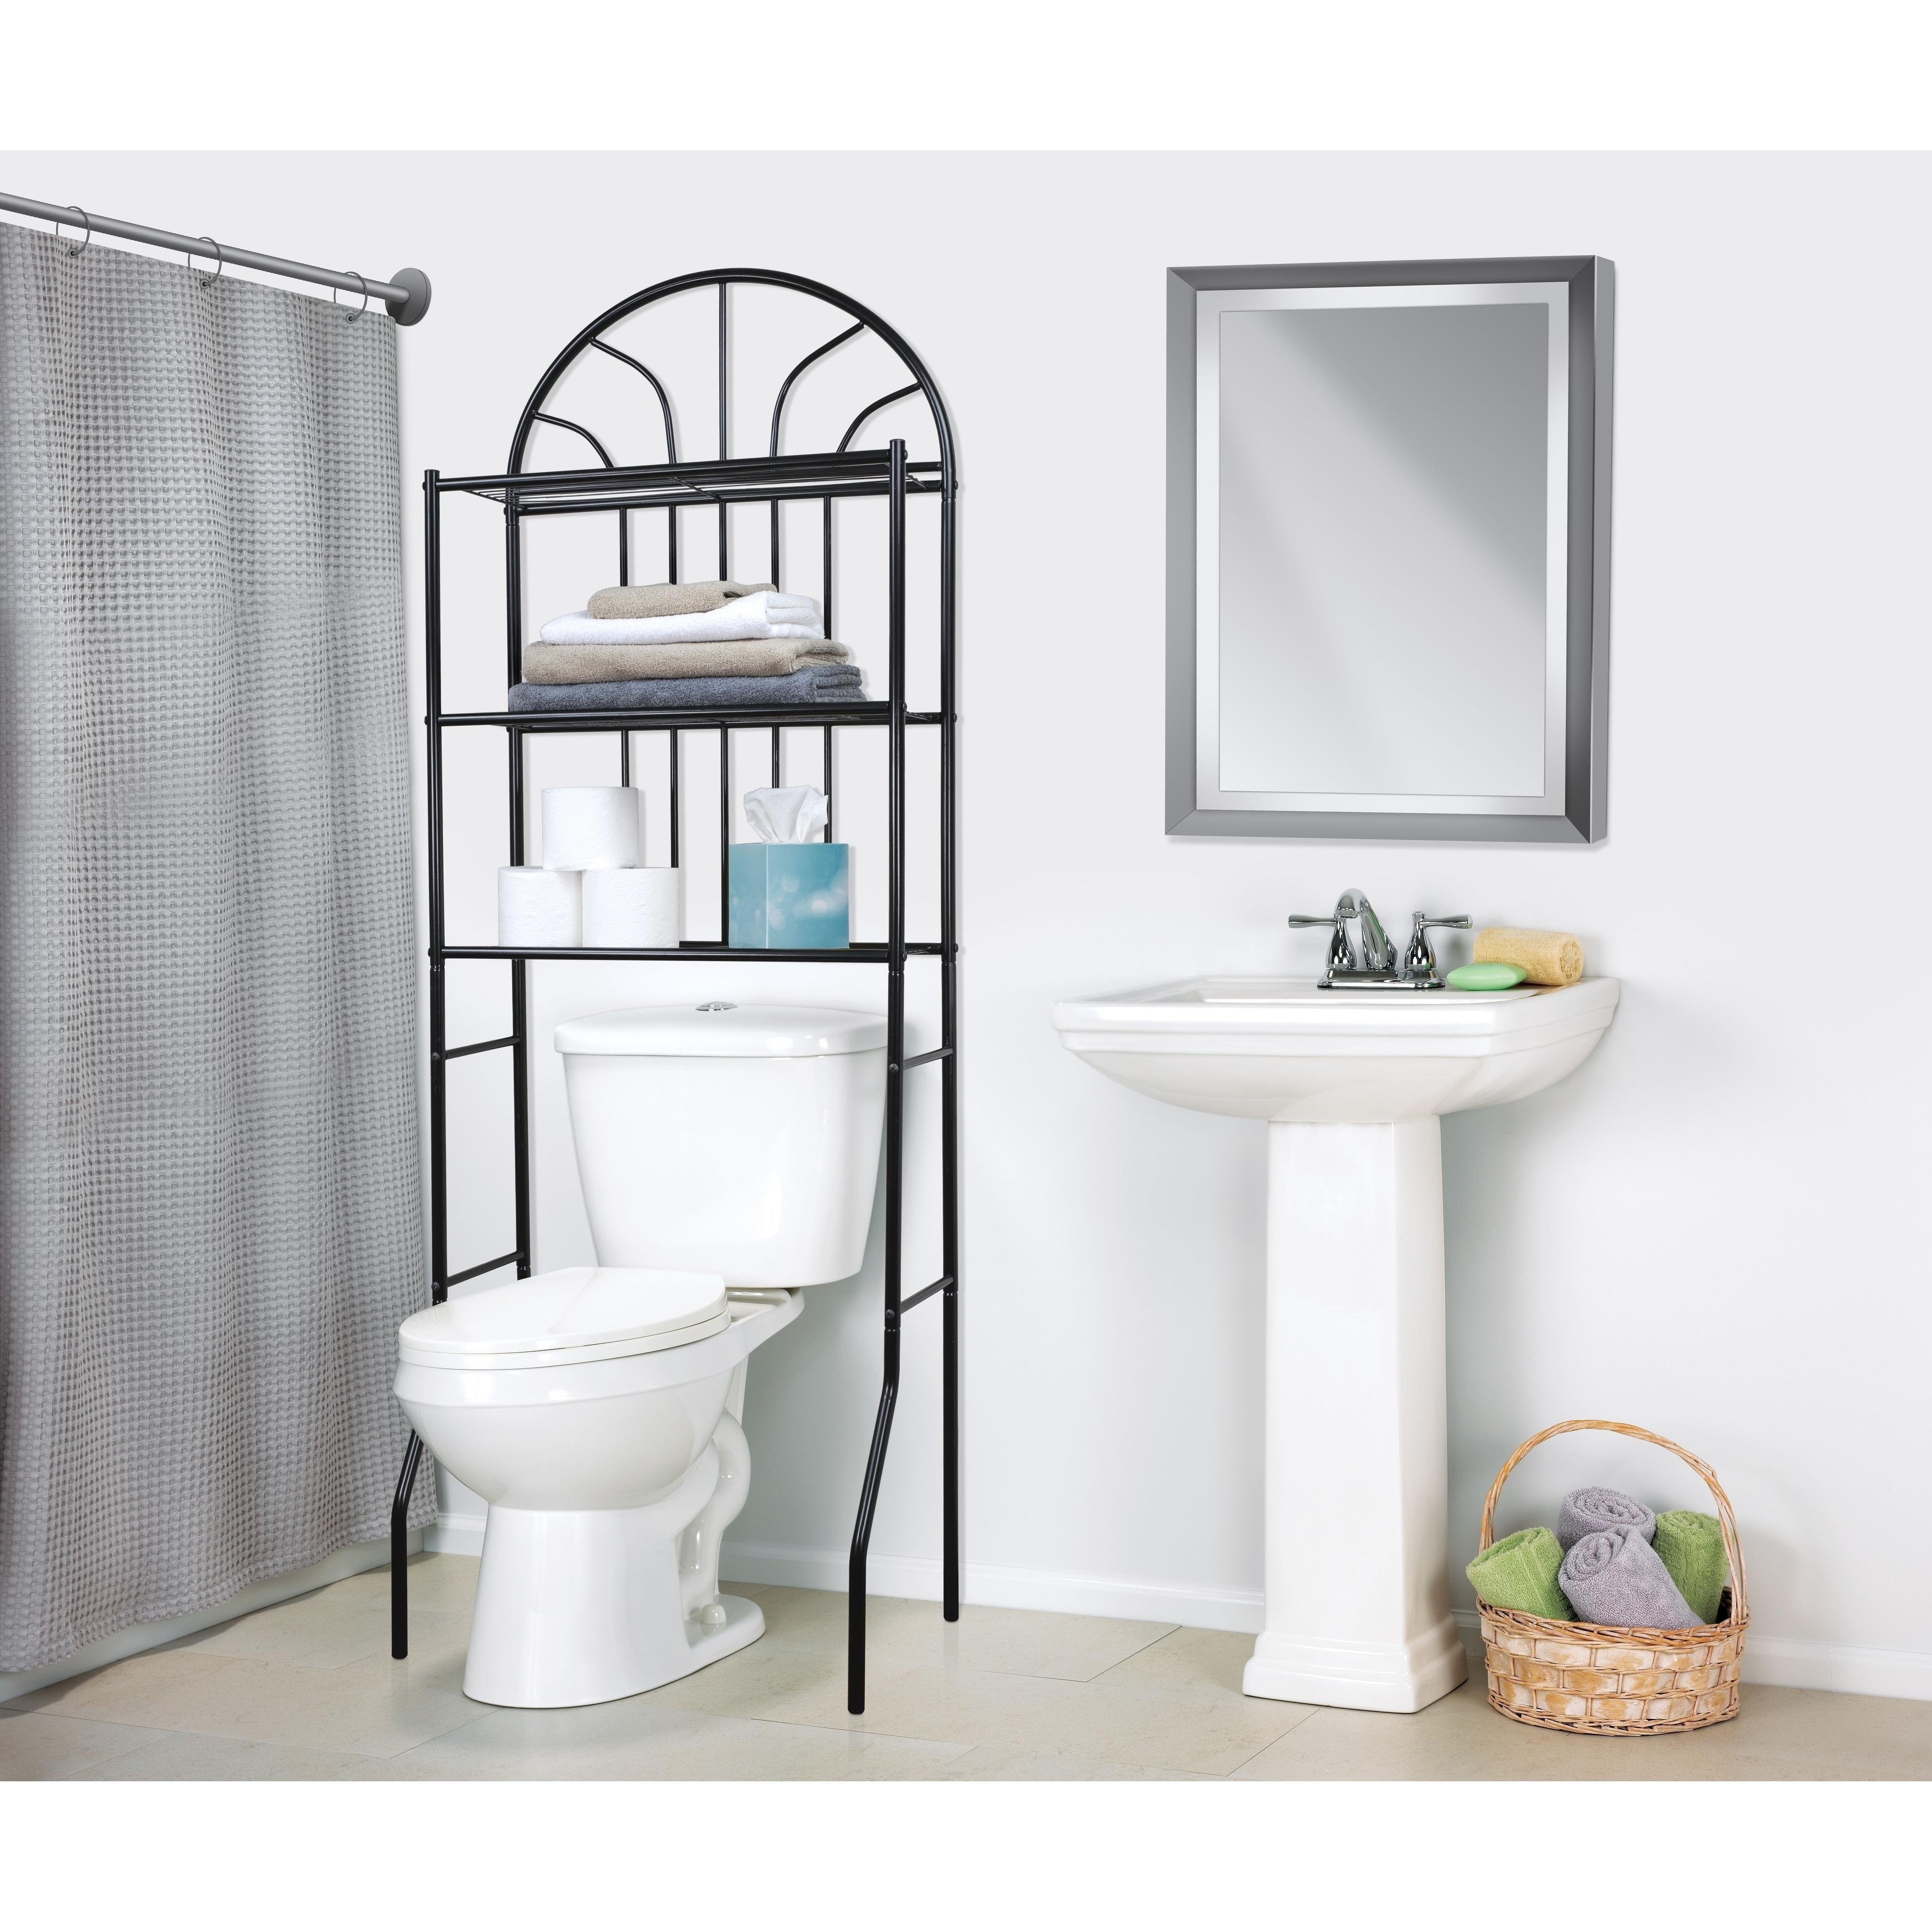 Home Basics Black Steel 2 Shelf Bathroom E Saver Free Shipping Today 10411332